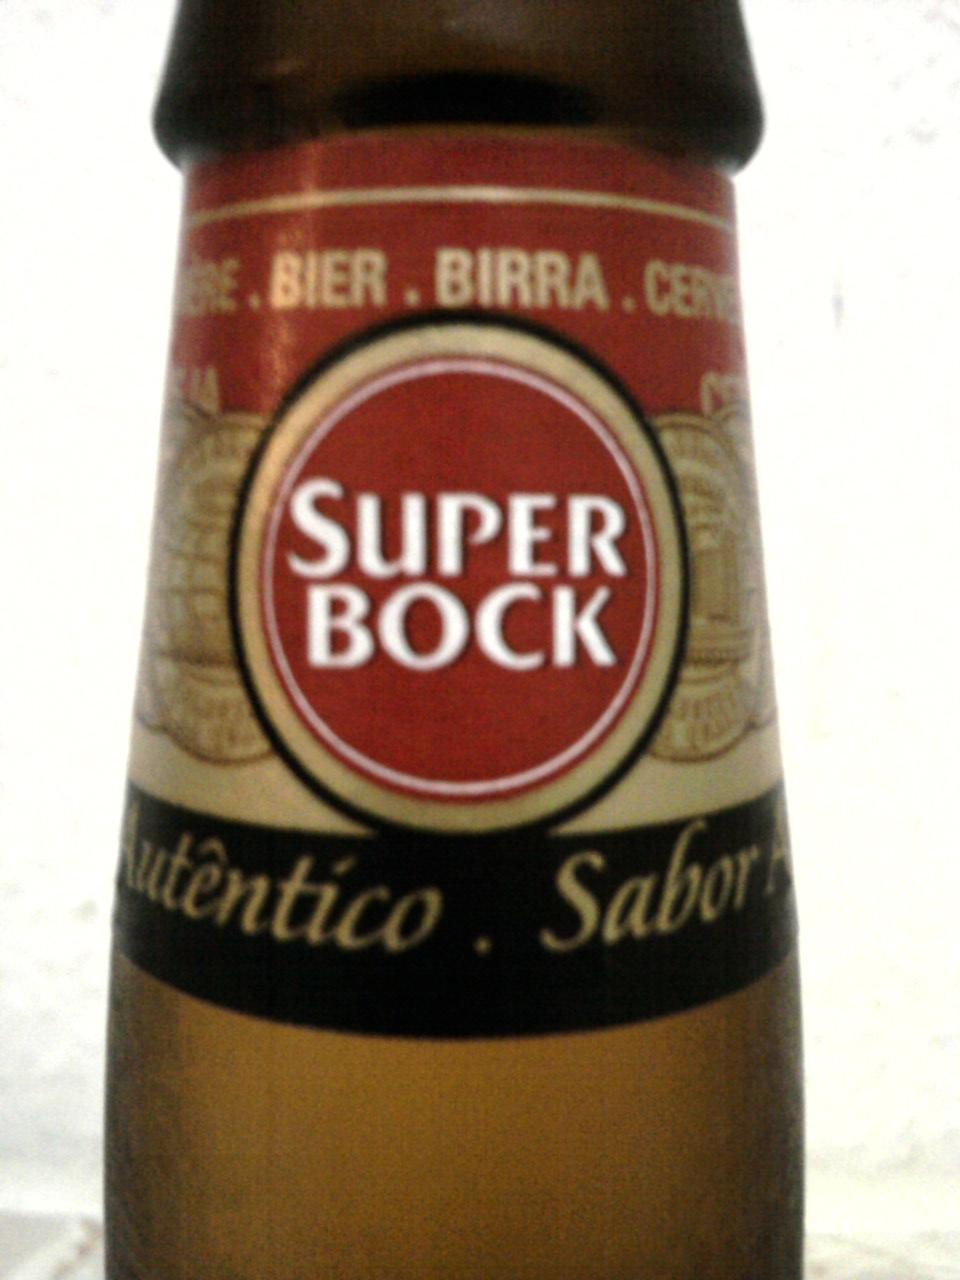 Super Bock neck label